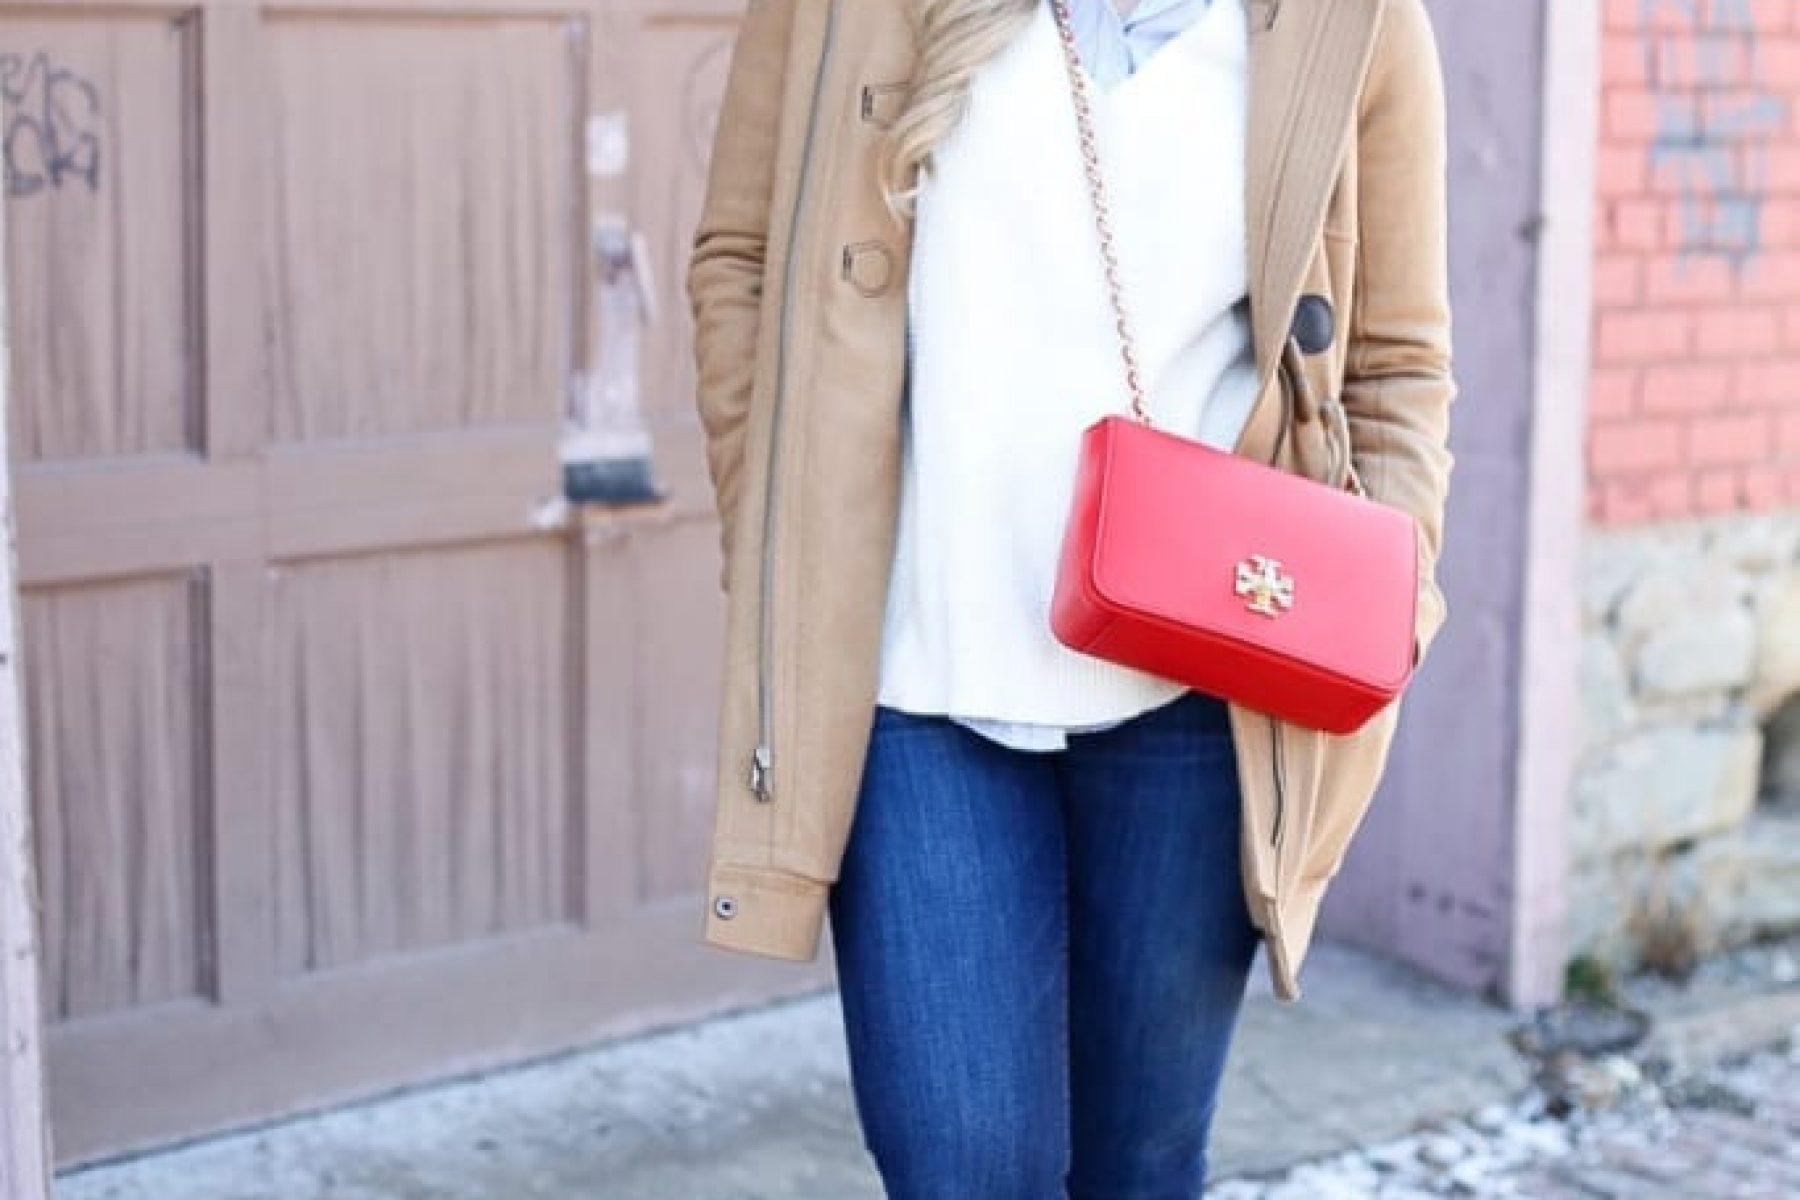 Vamp, Blogger, Fashion, Winter, Pittsburgh, Tory Burch Bag, Joe's Jeans, Layered (6 of 6)